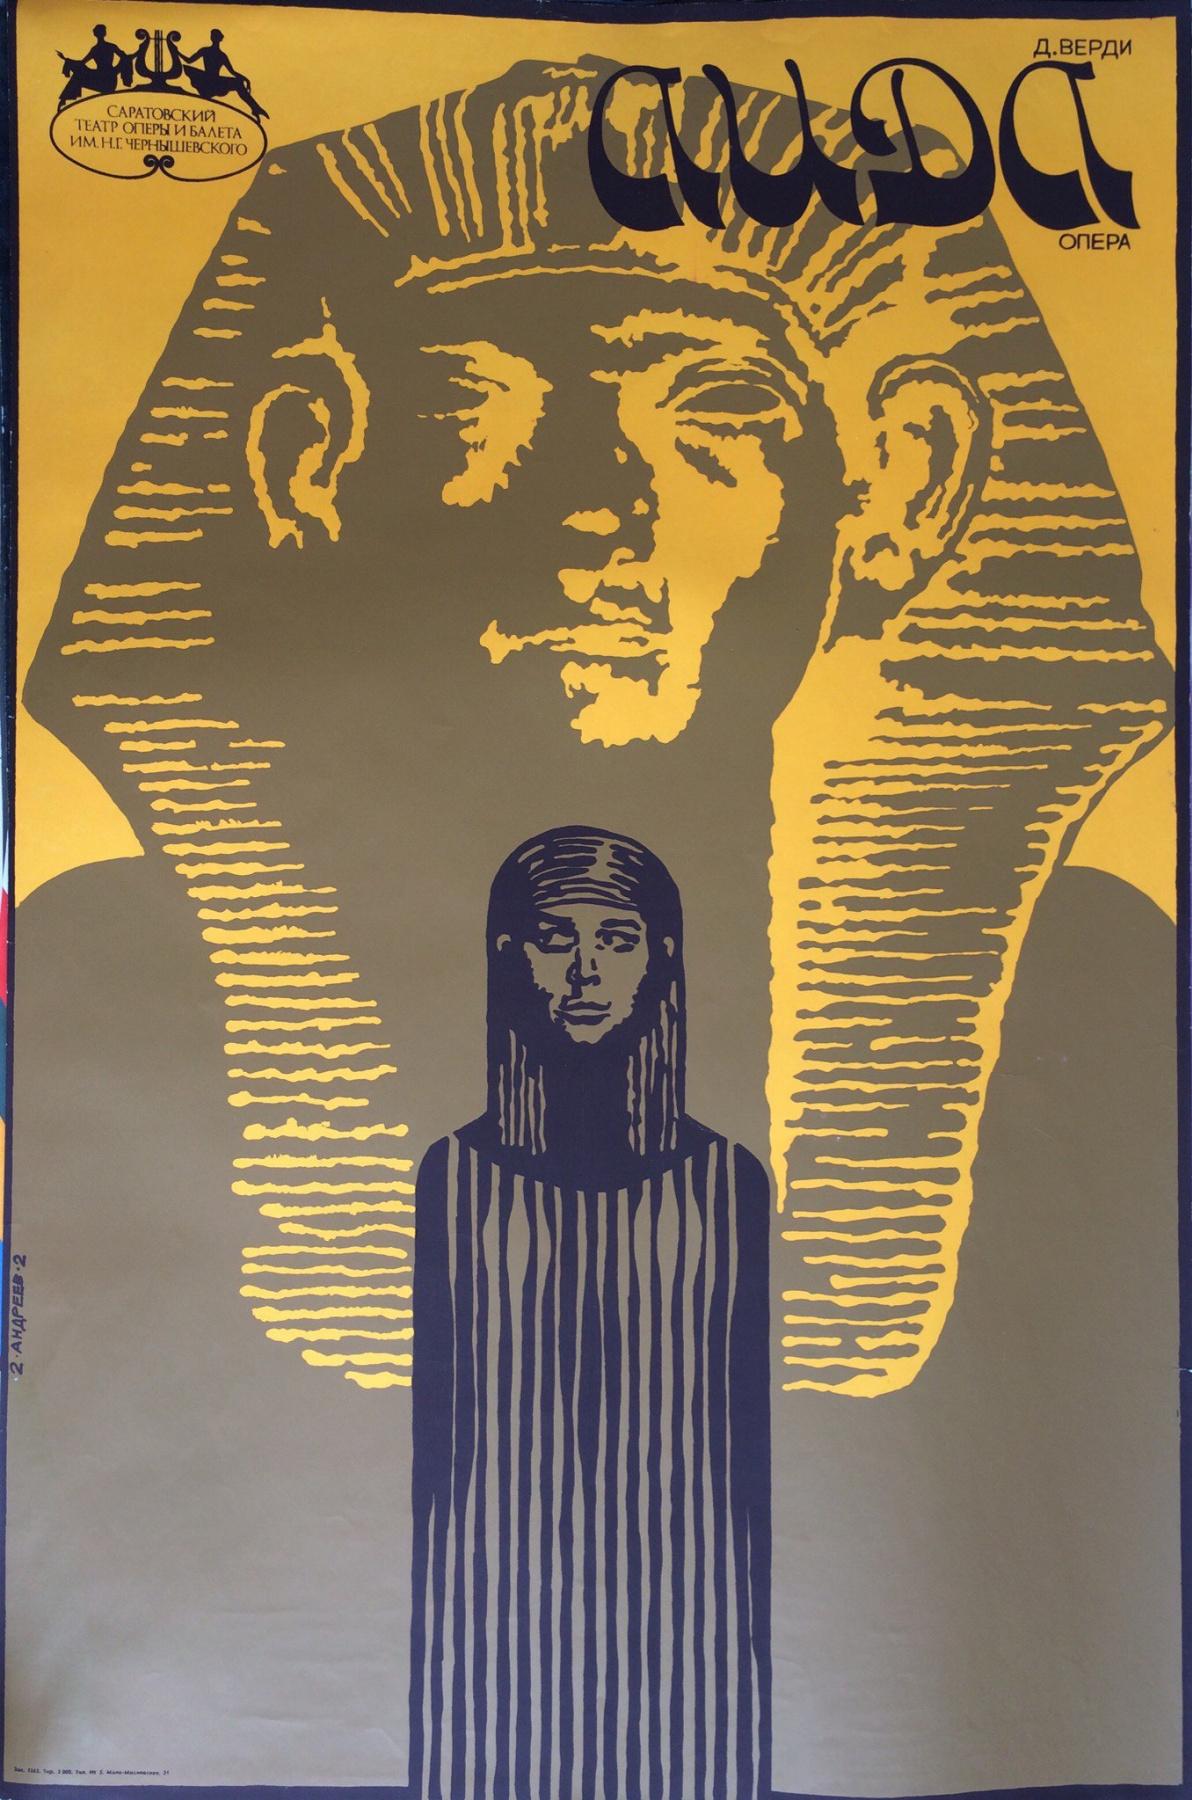 "2 Andreev. Poster for Verdi's opera ""Aida"" 70s Vintage"